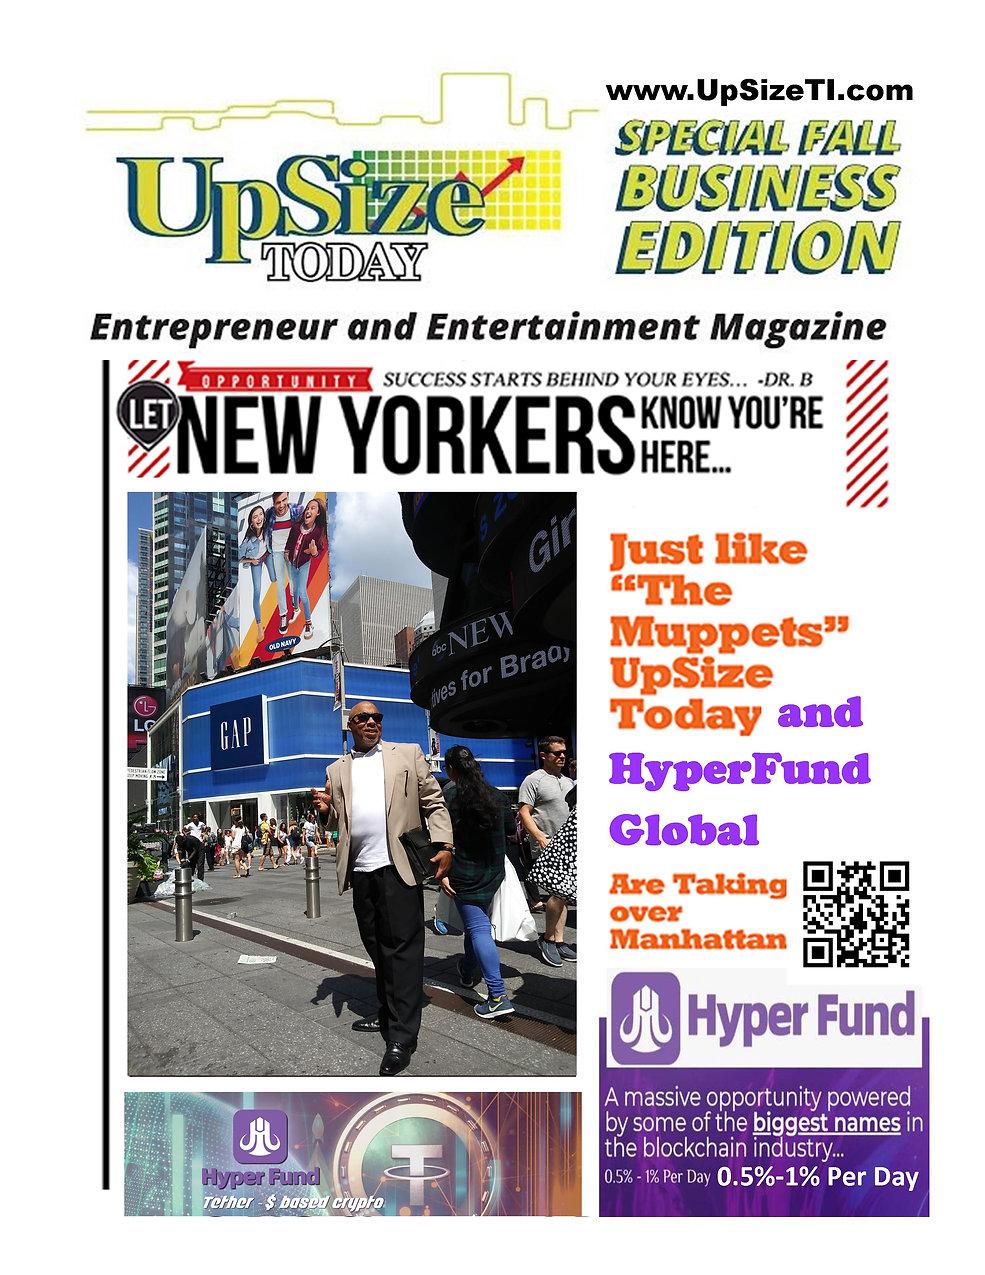 UpSizeTI flyer invite 1.jpg